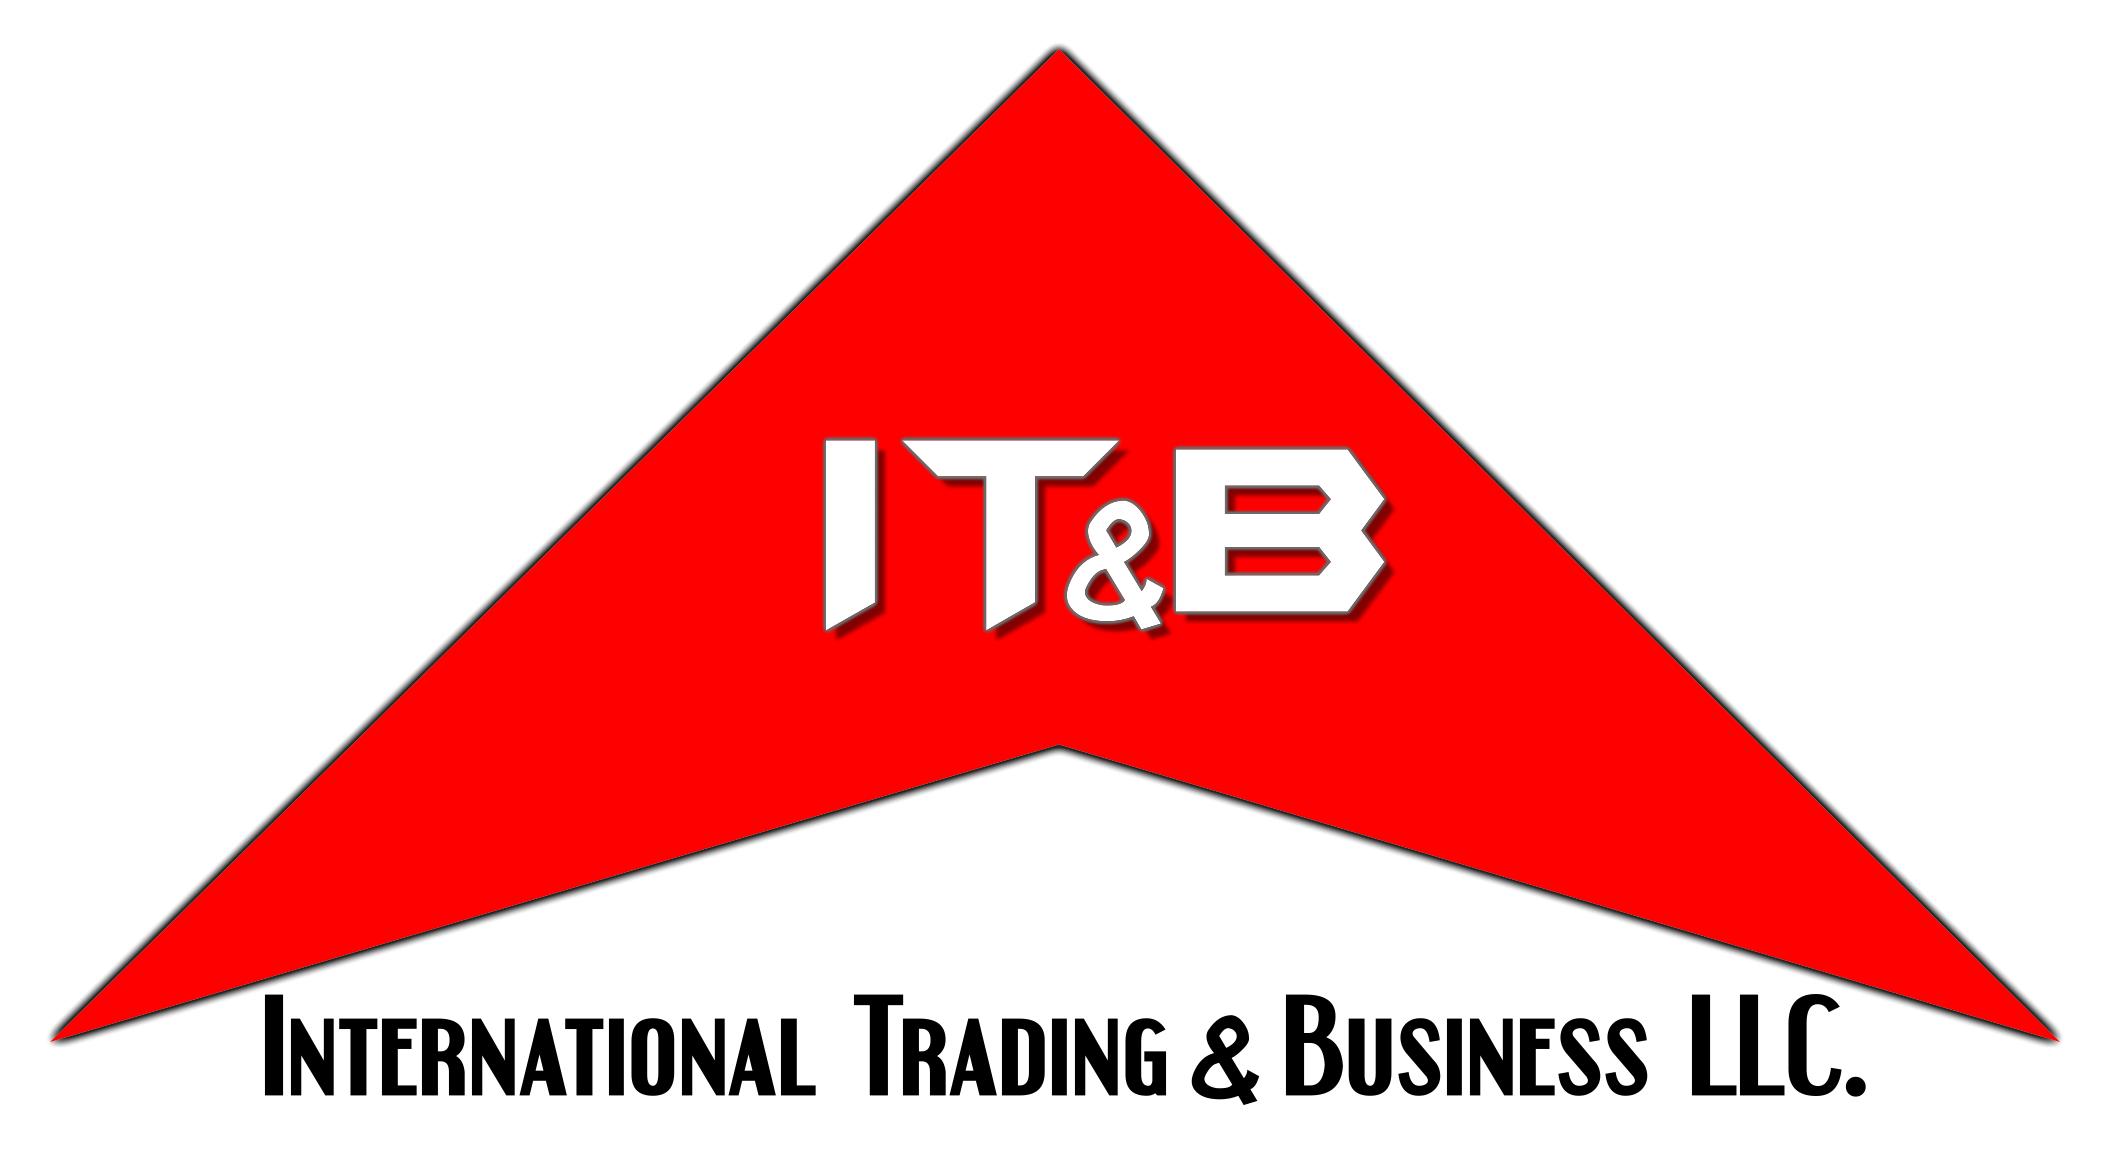 International Trading & Business Llc.